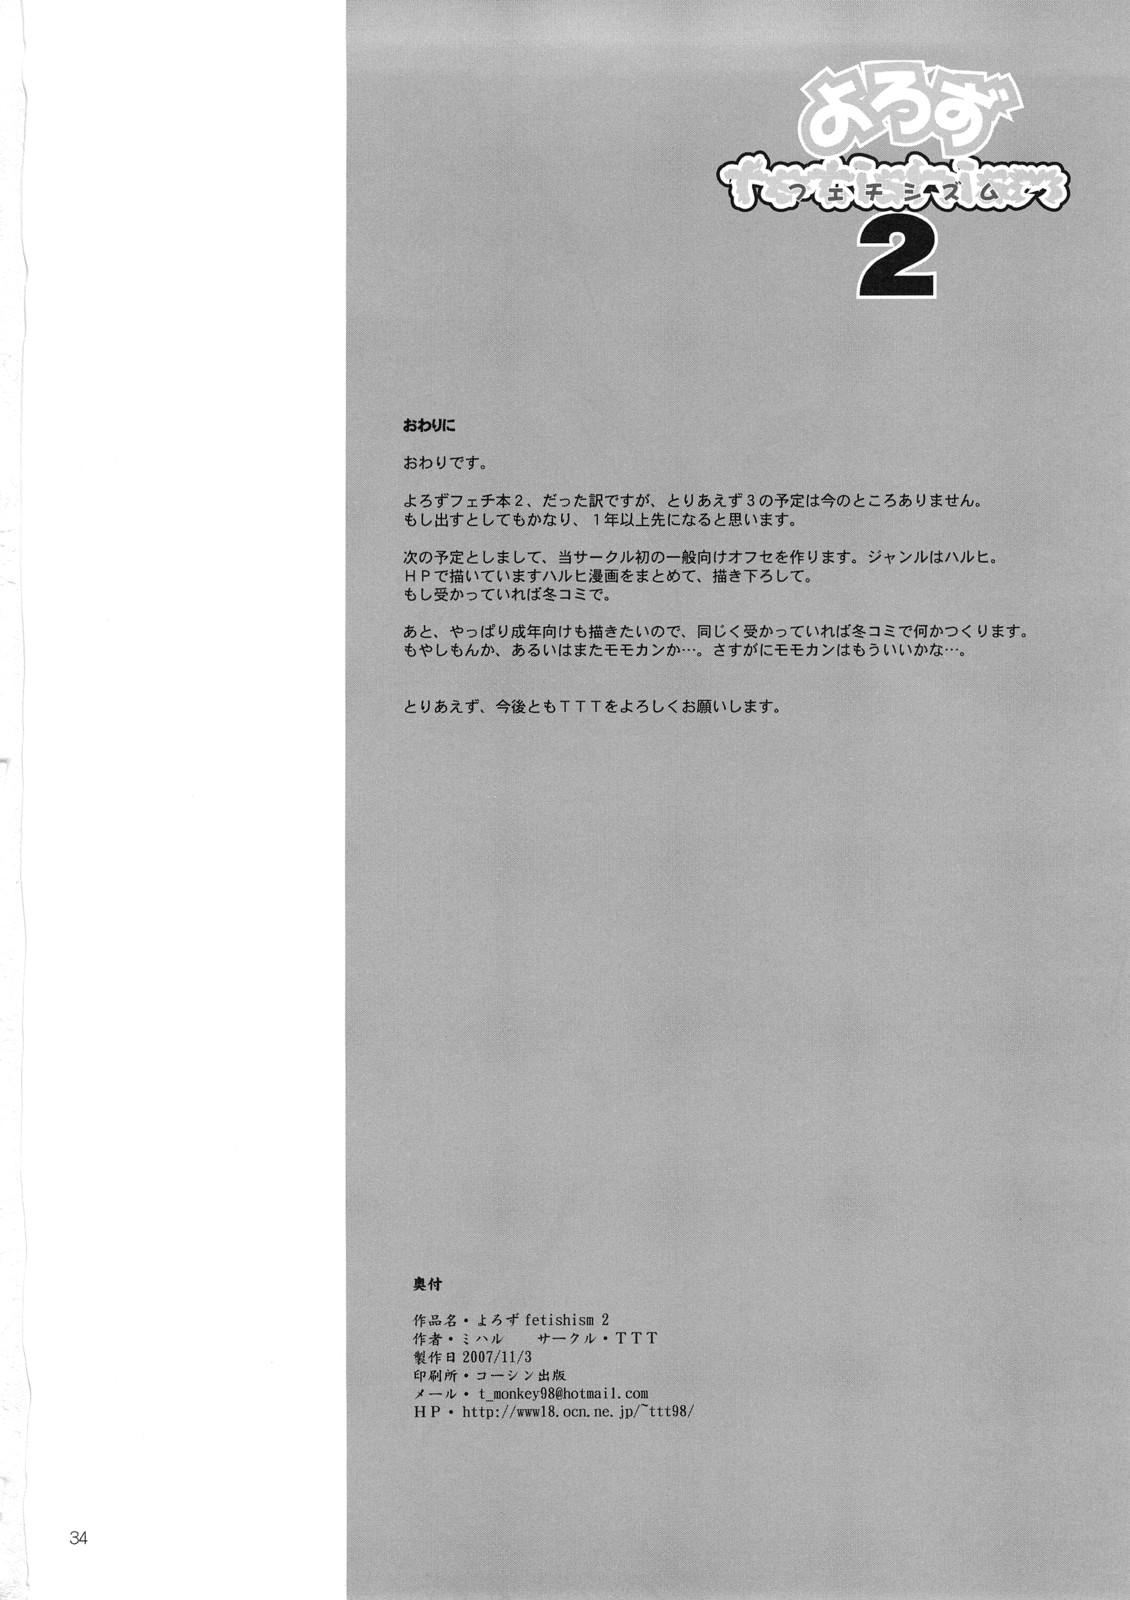 Yorozu fetishism 2 32